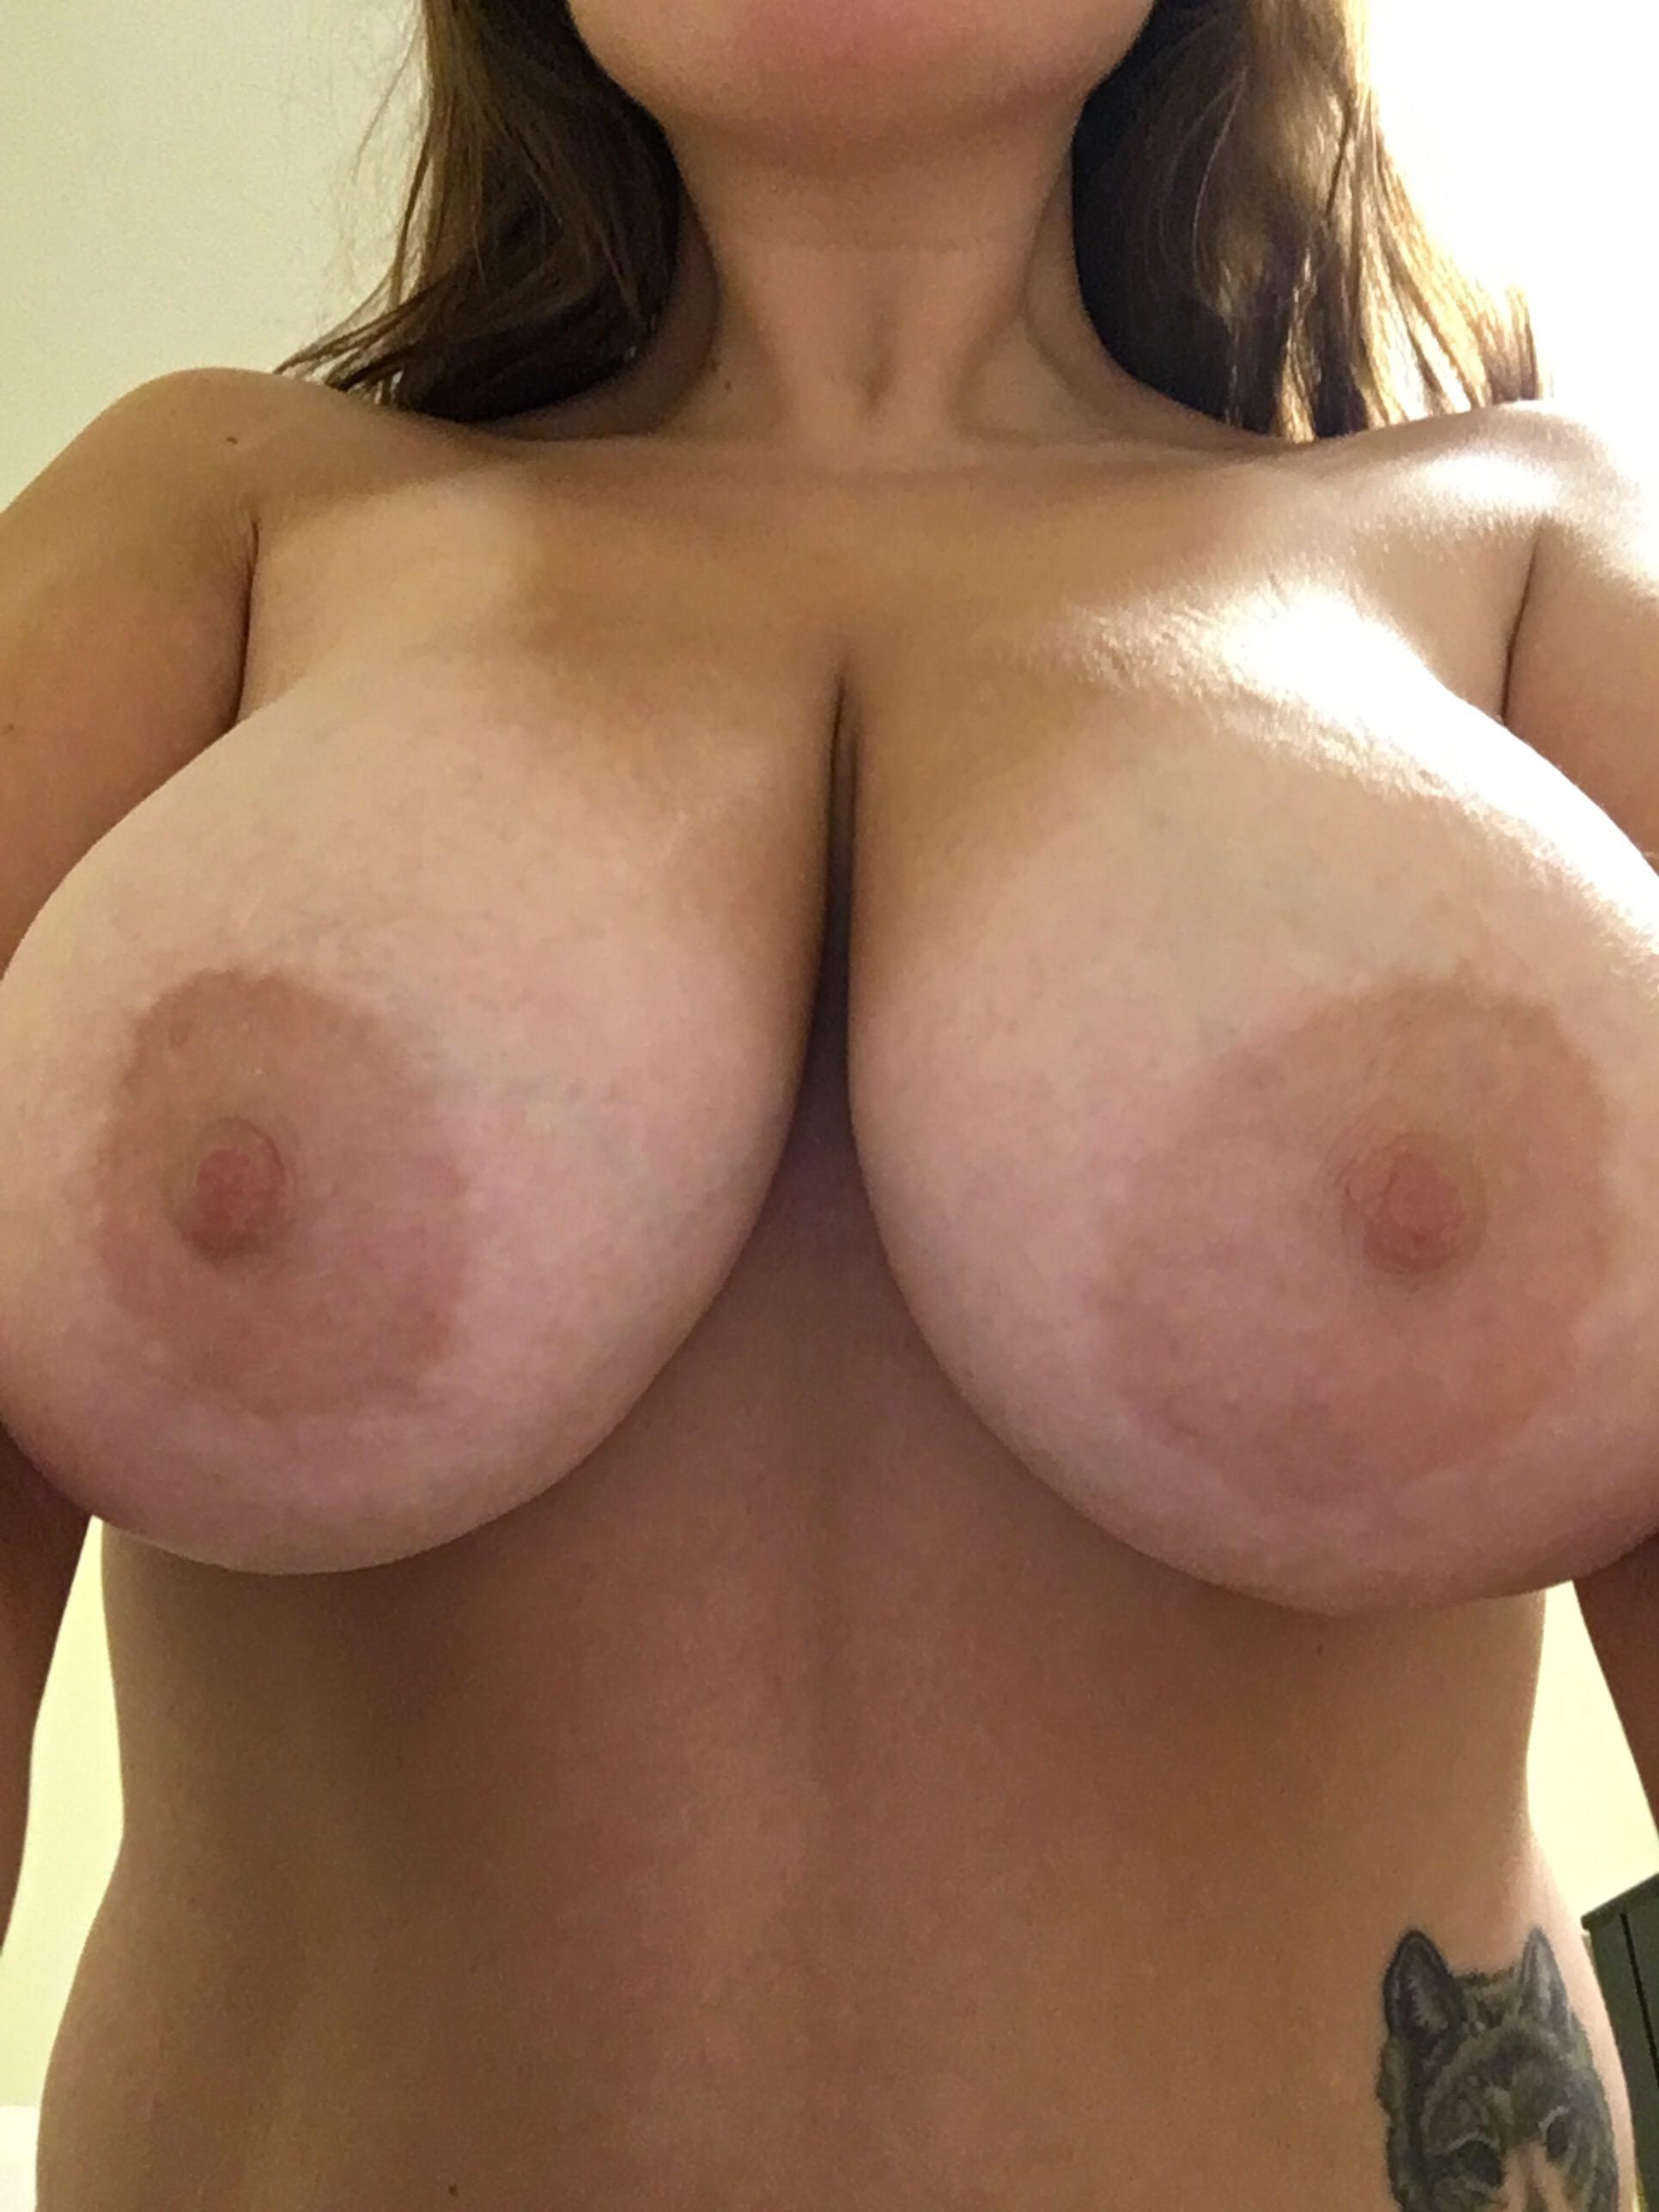 Hot girl boobs full hd